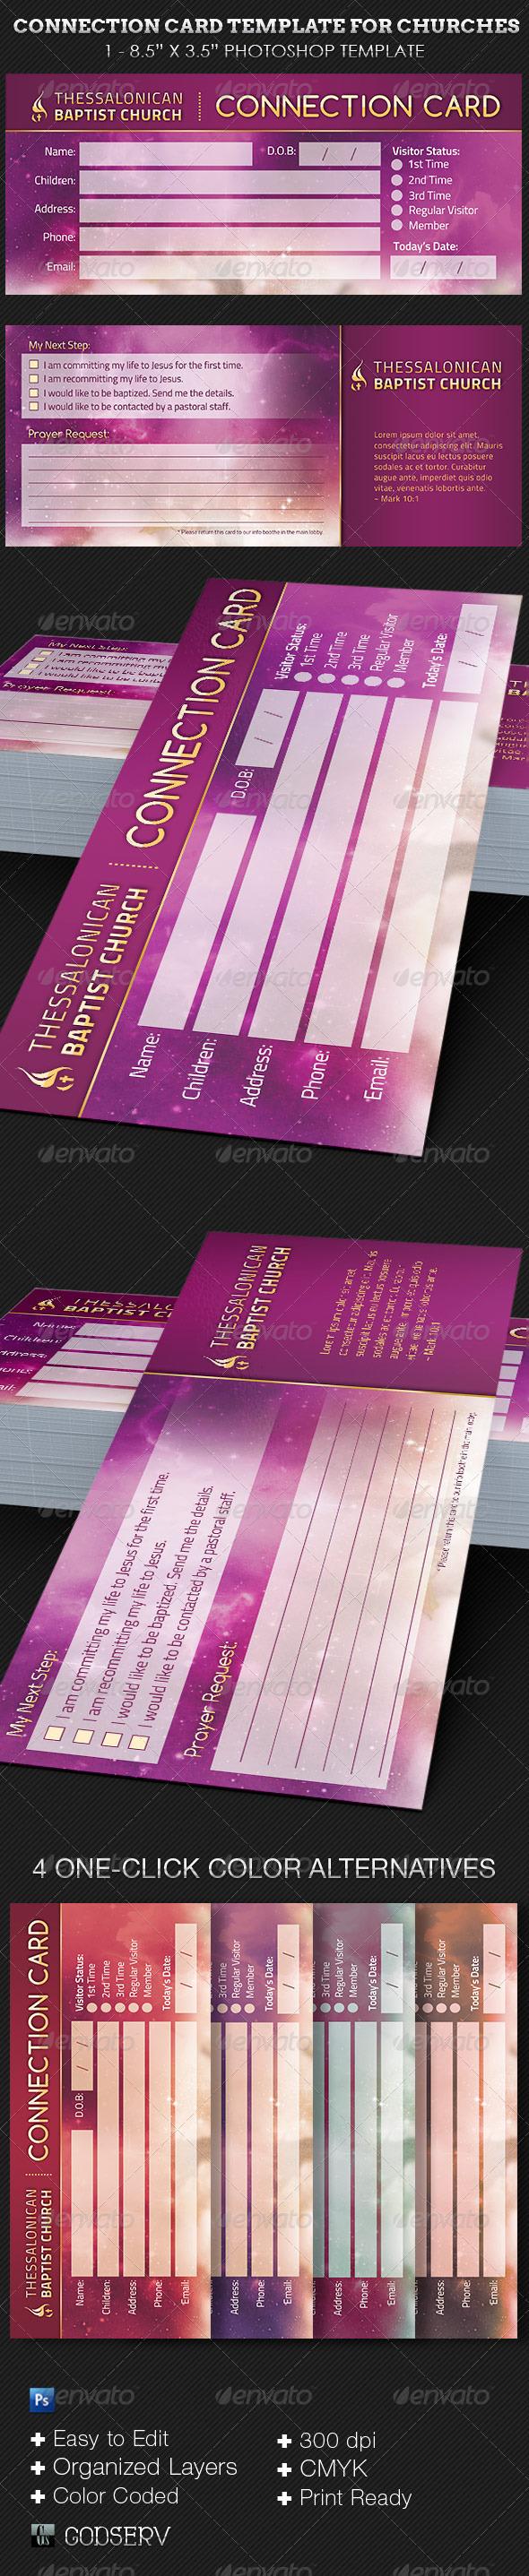 Heaven Church Connection Card Template - Church Flyers